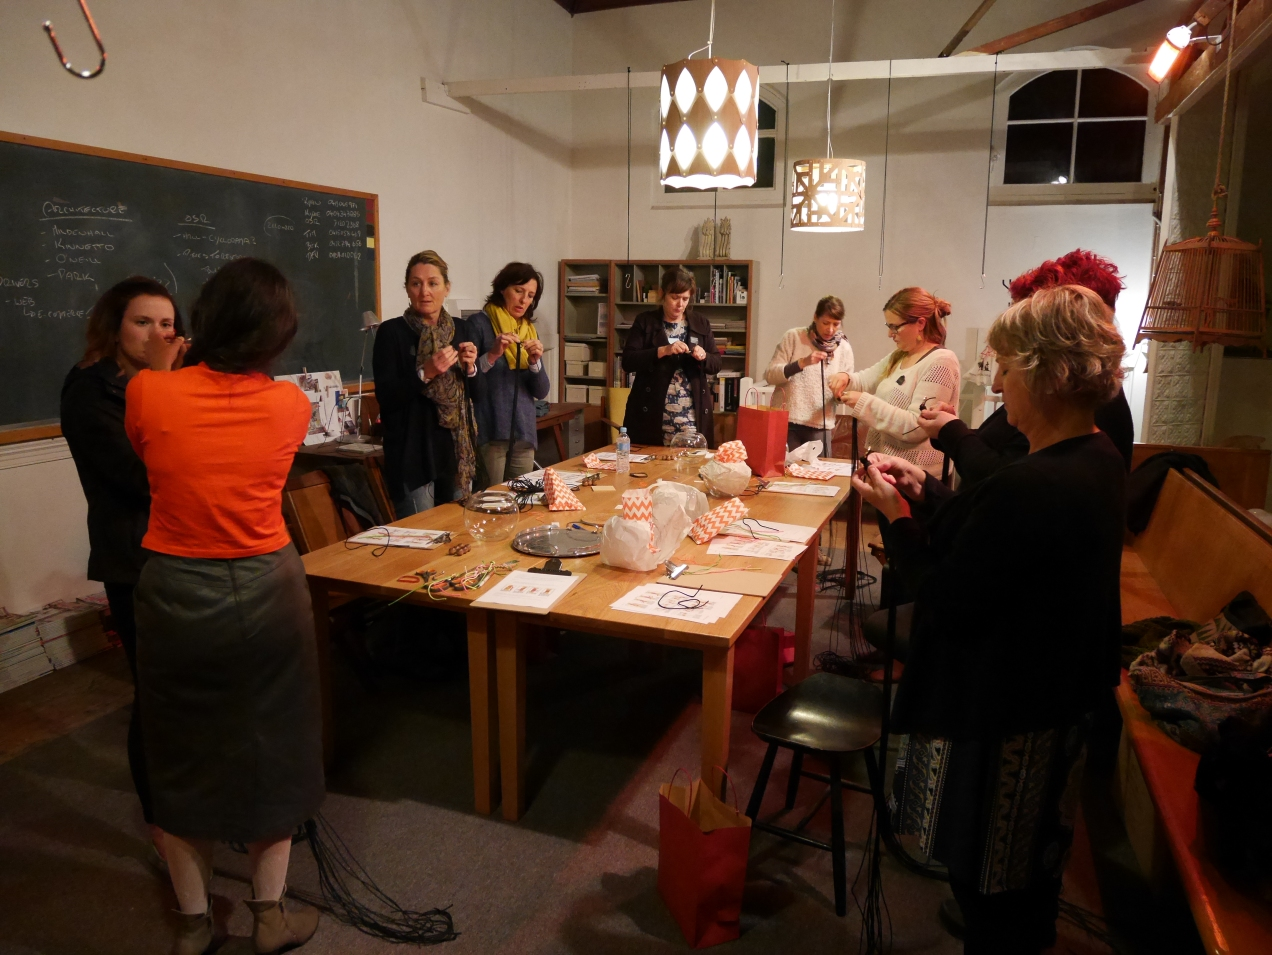 macrame workshop Adelaide Australia